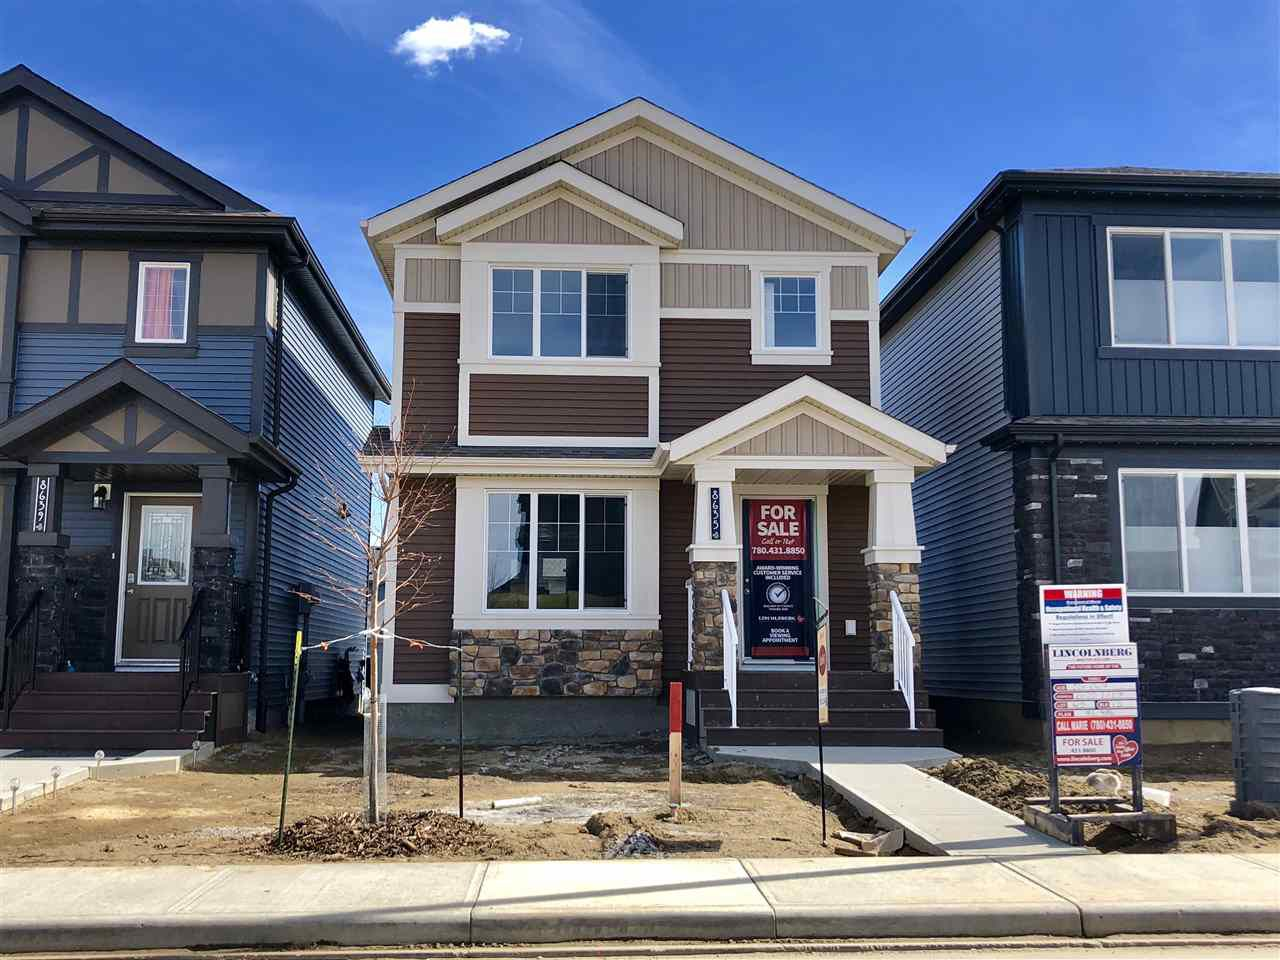 Main Photo: 8635 221 Street in Edmonton: Zone 58 House for sale : MLS®# E4147673